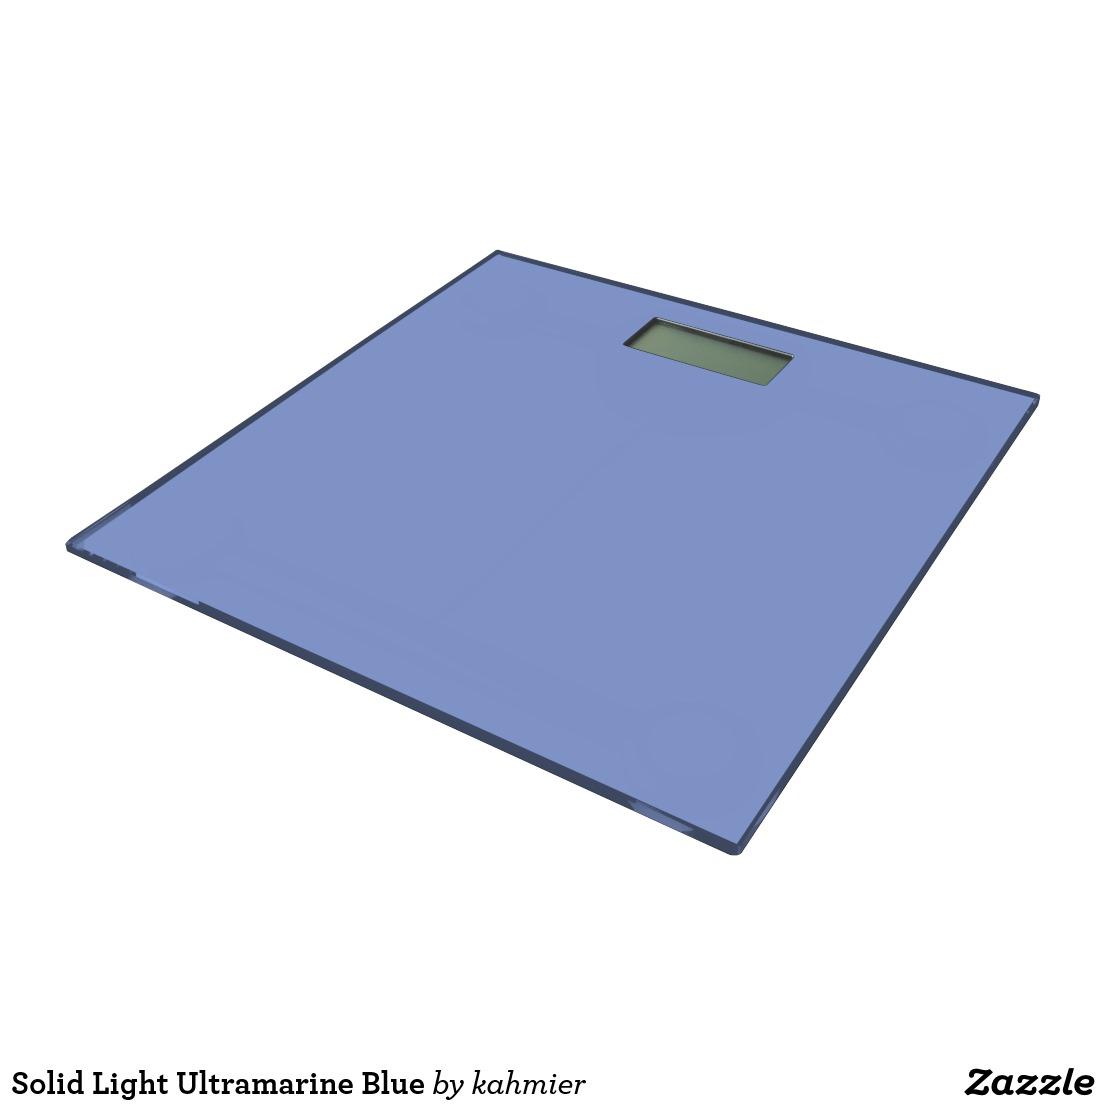 Solid Light Ultramarine Blue Bathroom Scale